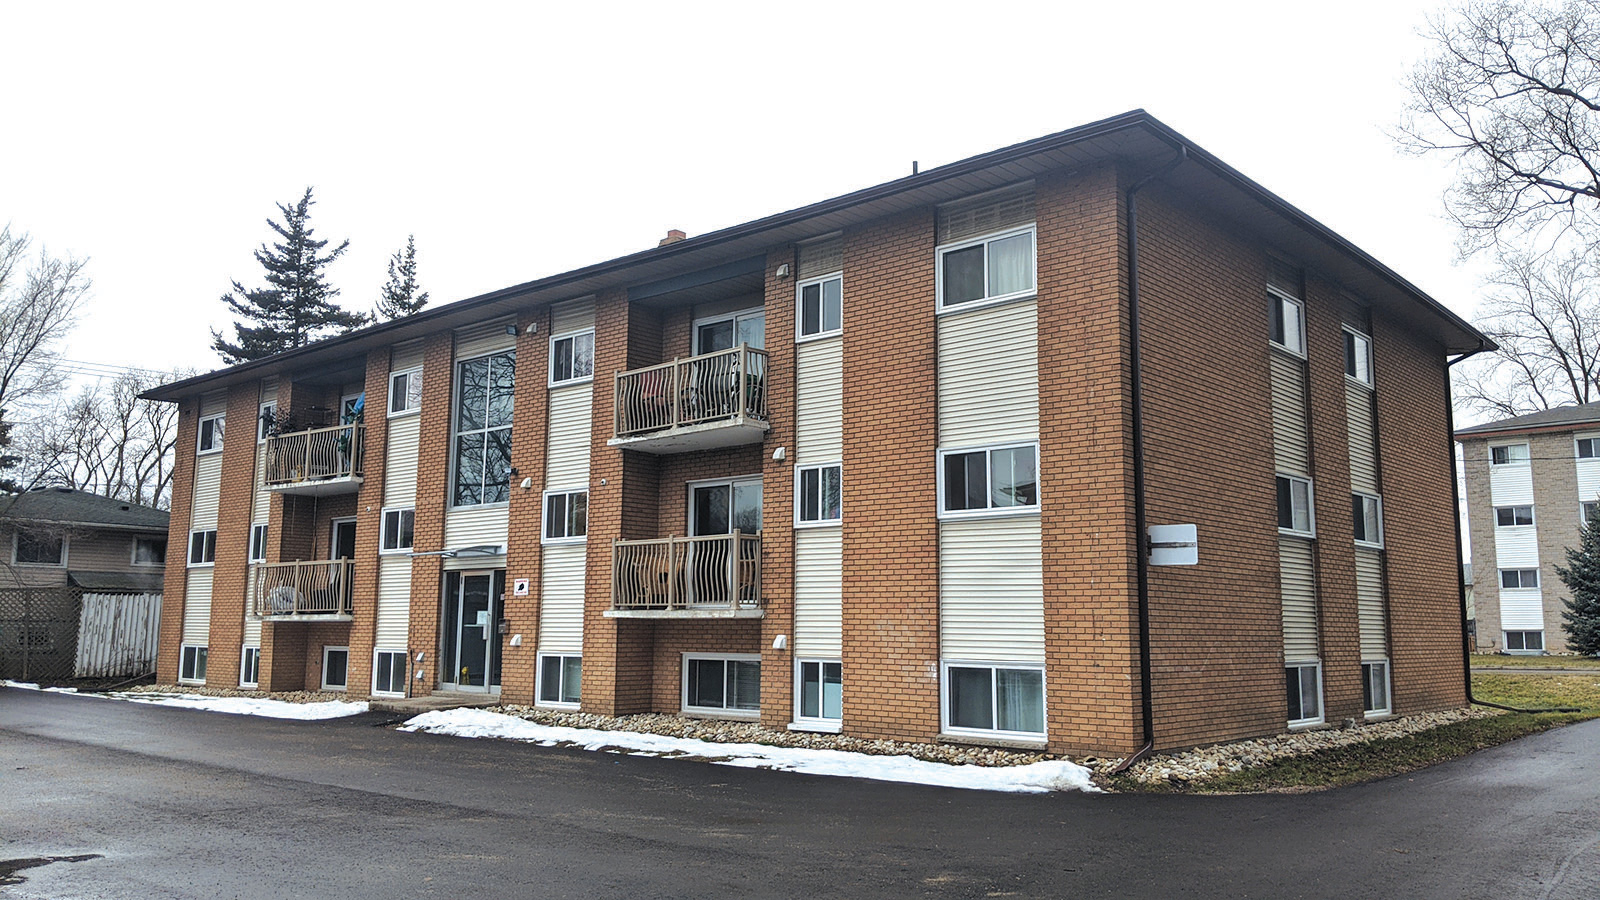 11 Unit Apartment Building